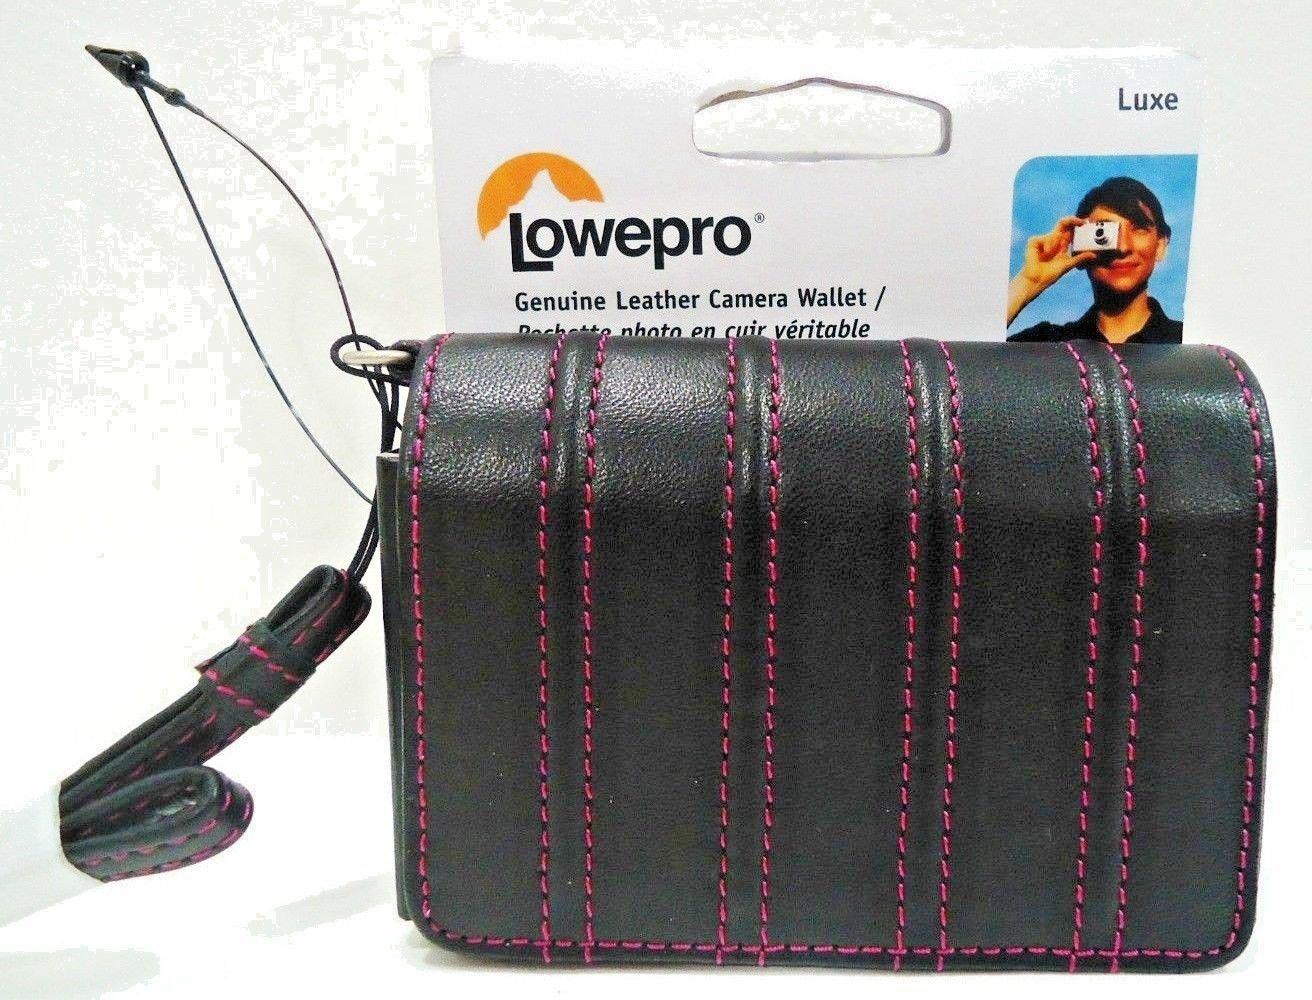 LOWEPRO - UNIVERSAL - BLACK - PINK - LEATHER - CAMERA - WALLET - NEW - SAMSUNG